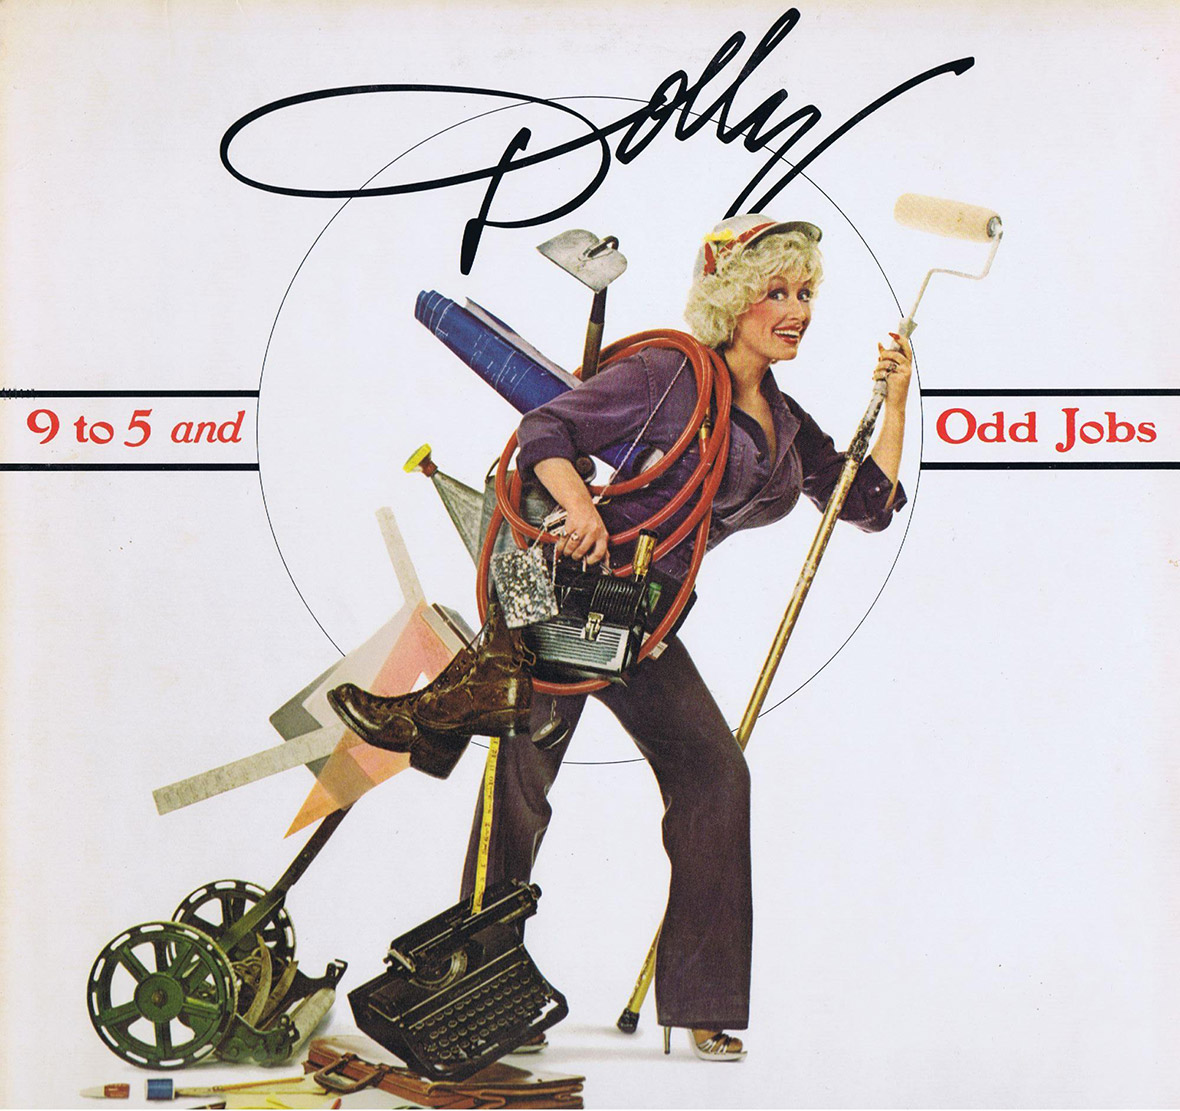 dolly-parton-turns-70-3.jpg